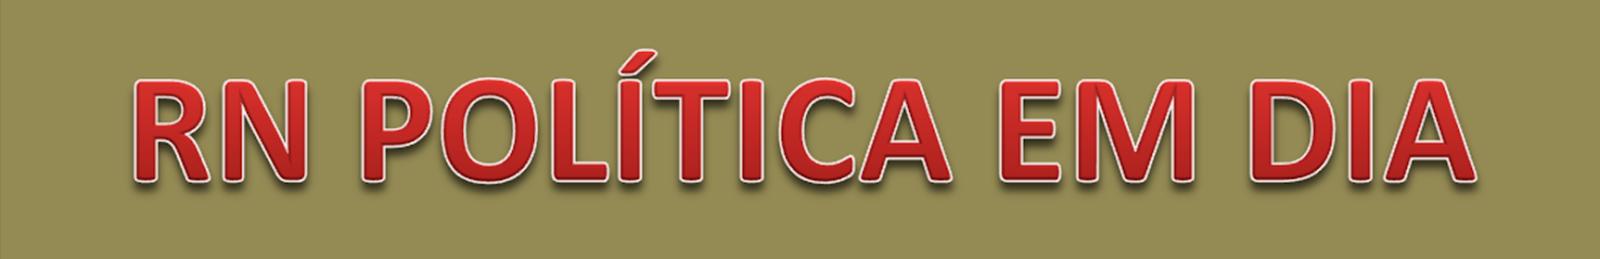 RNPOLITICAEMDIA2012.BLOGSPOT.COM